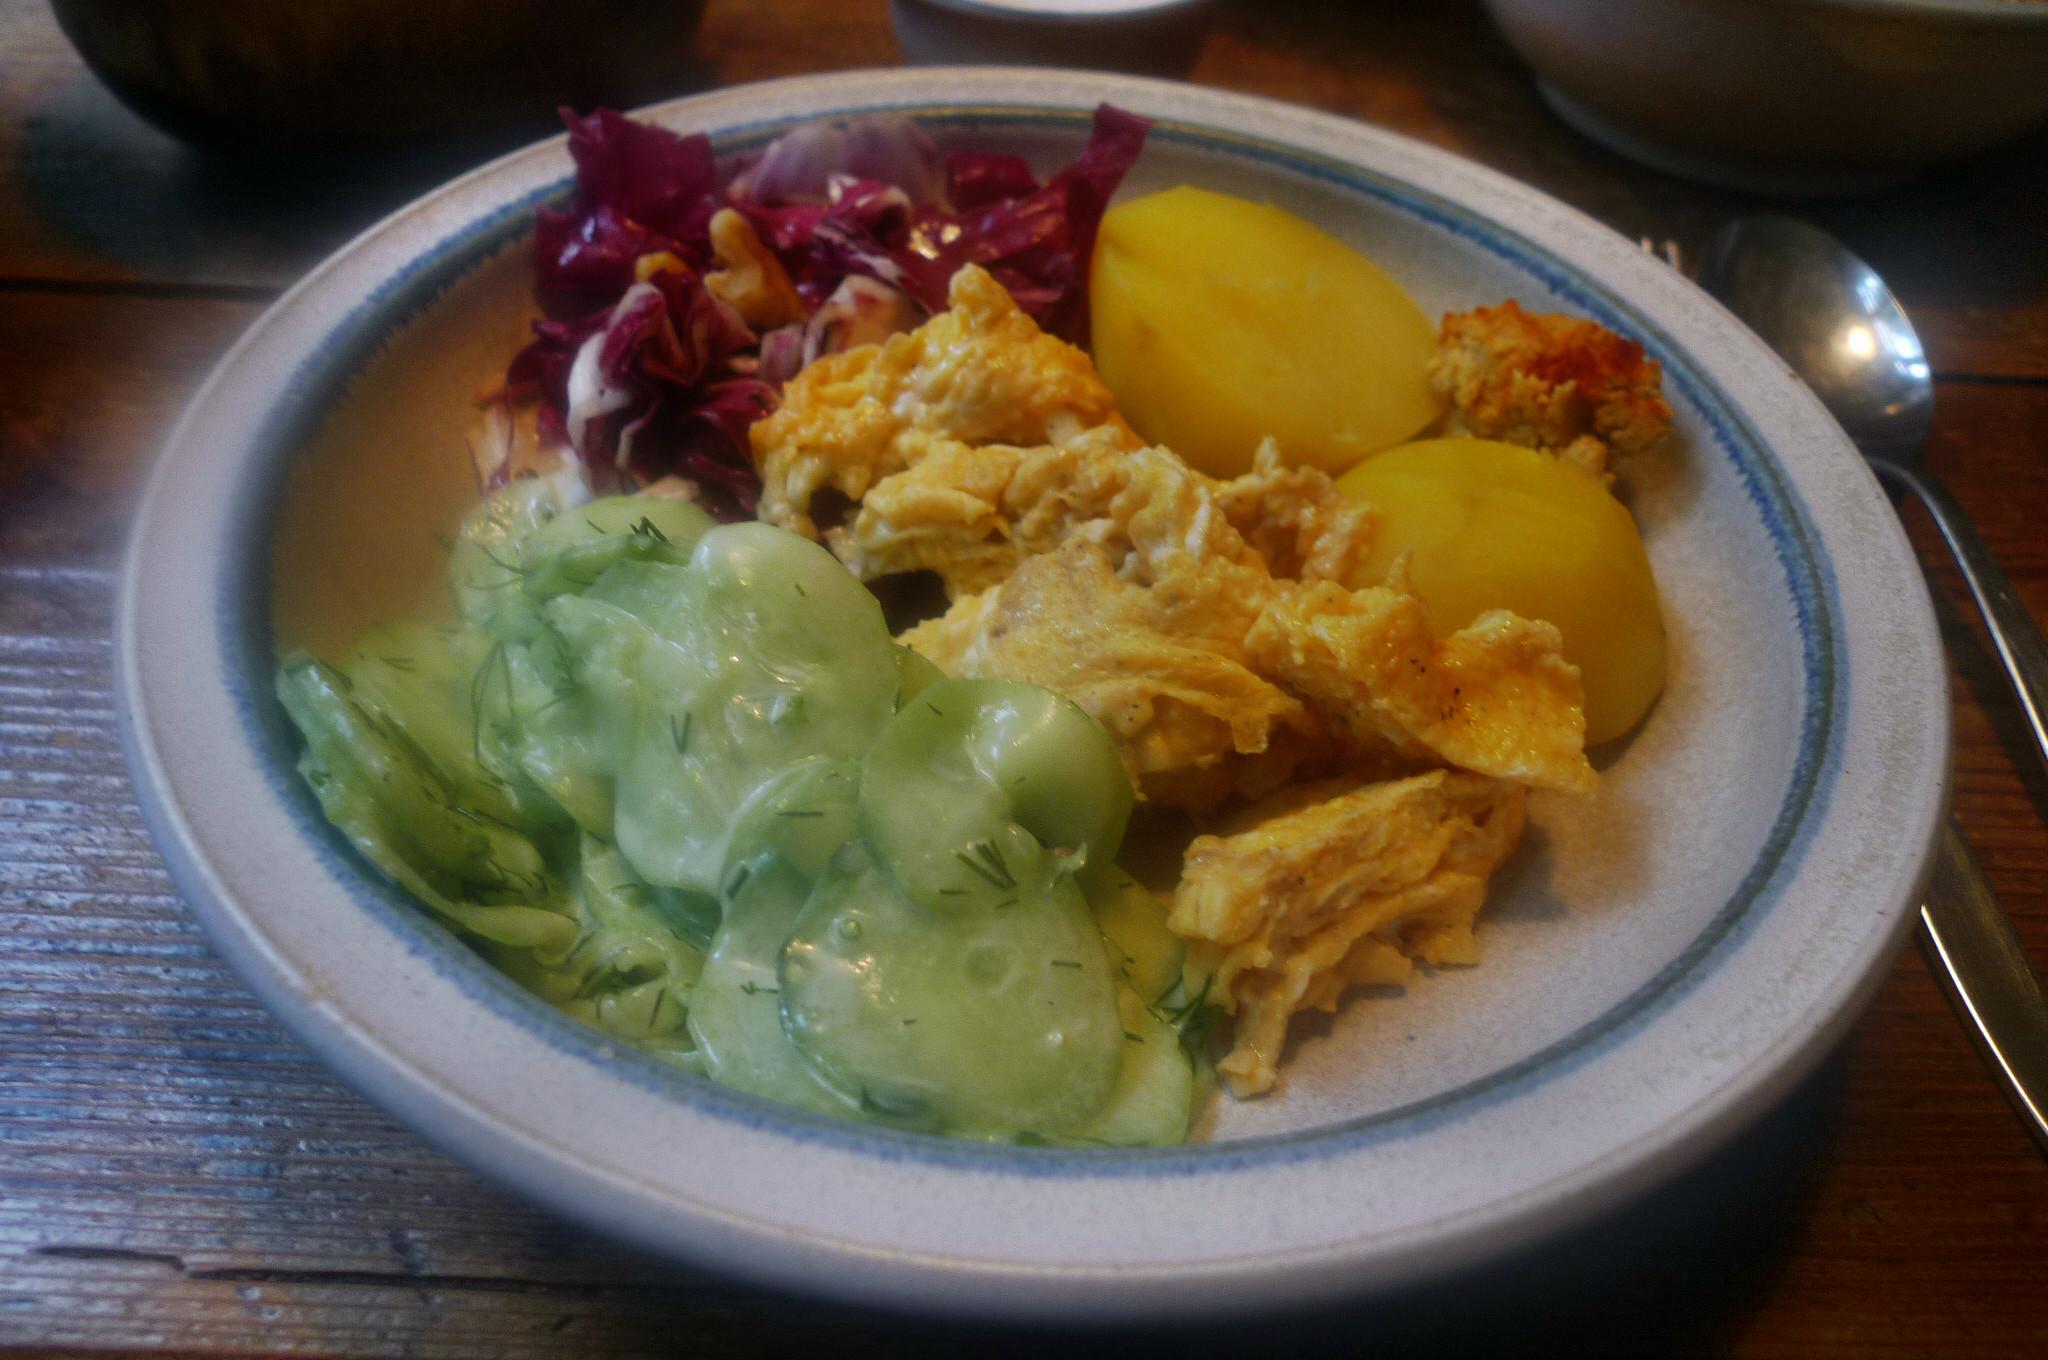 Kartoffel,Rührei,Salate,Humus -17.10.14   (1)